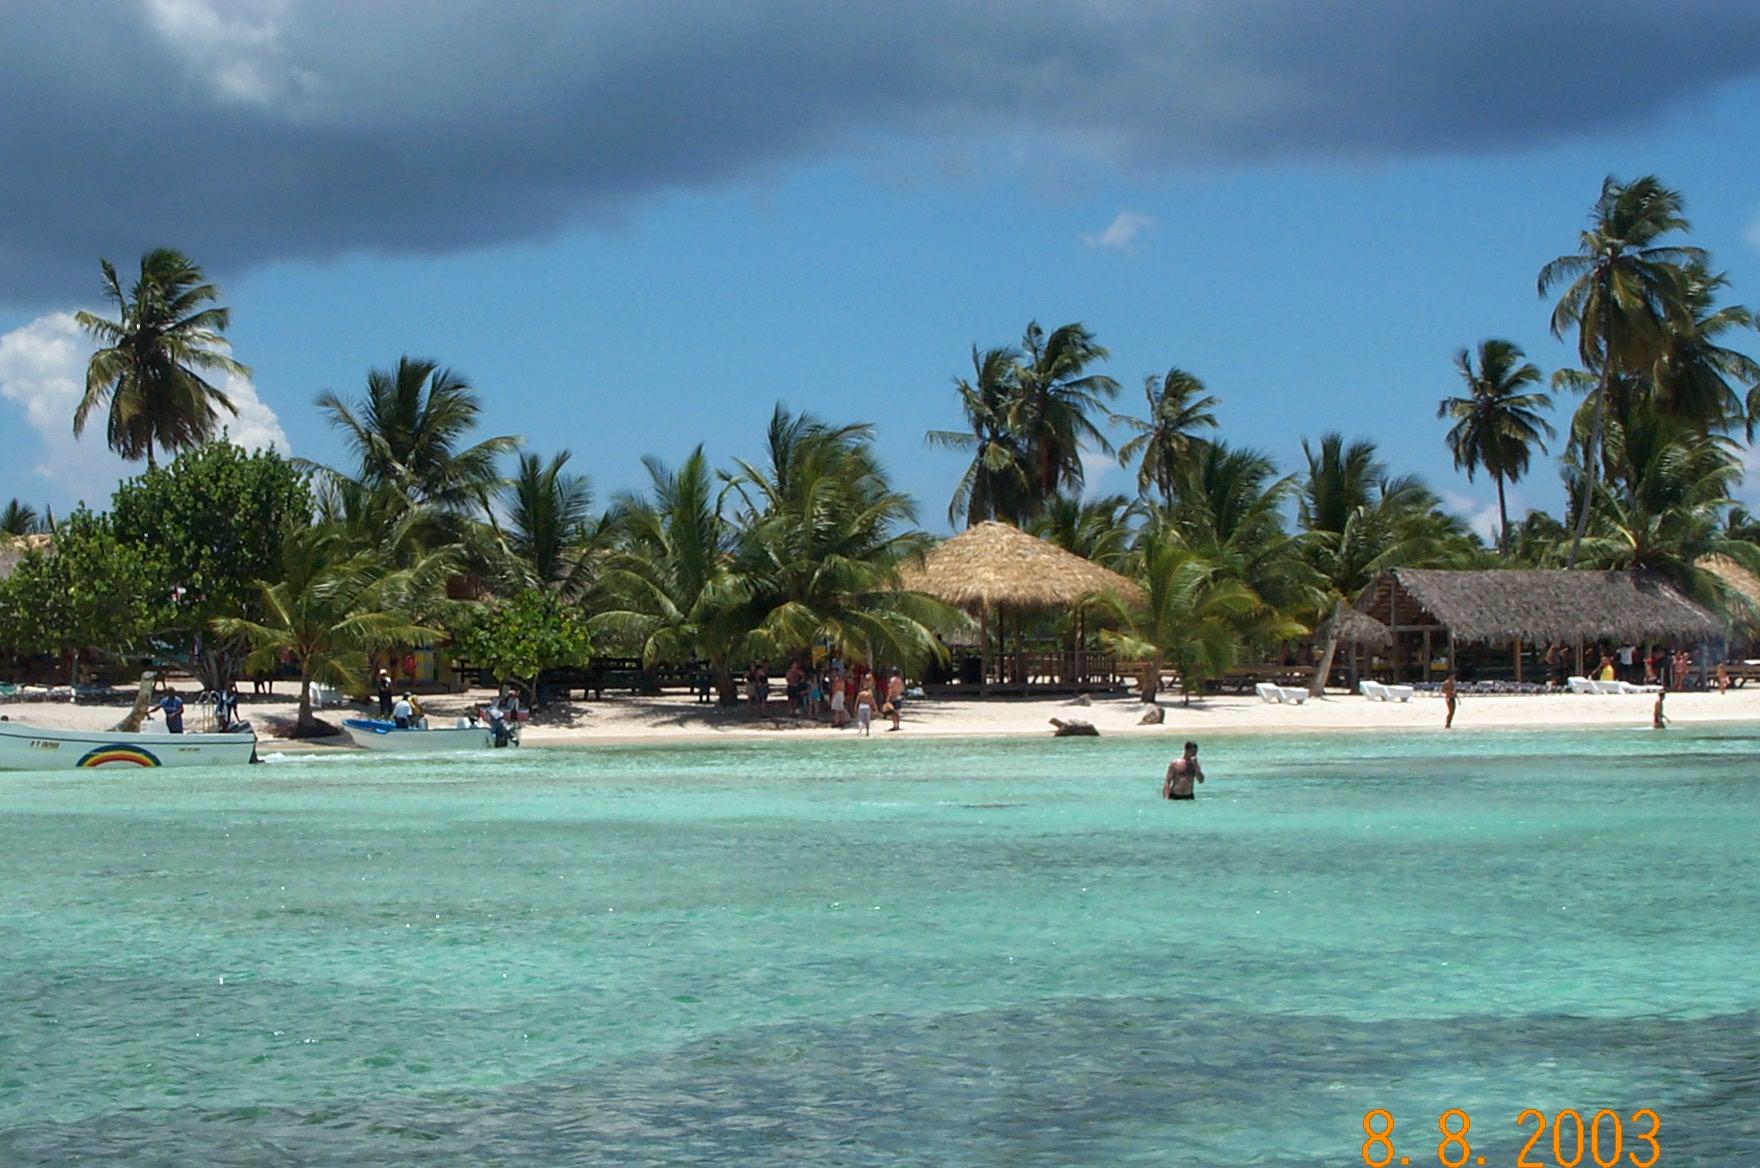 And Haiti Country Dominican Border Republic